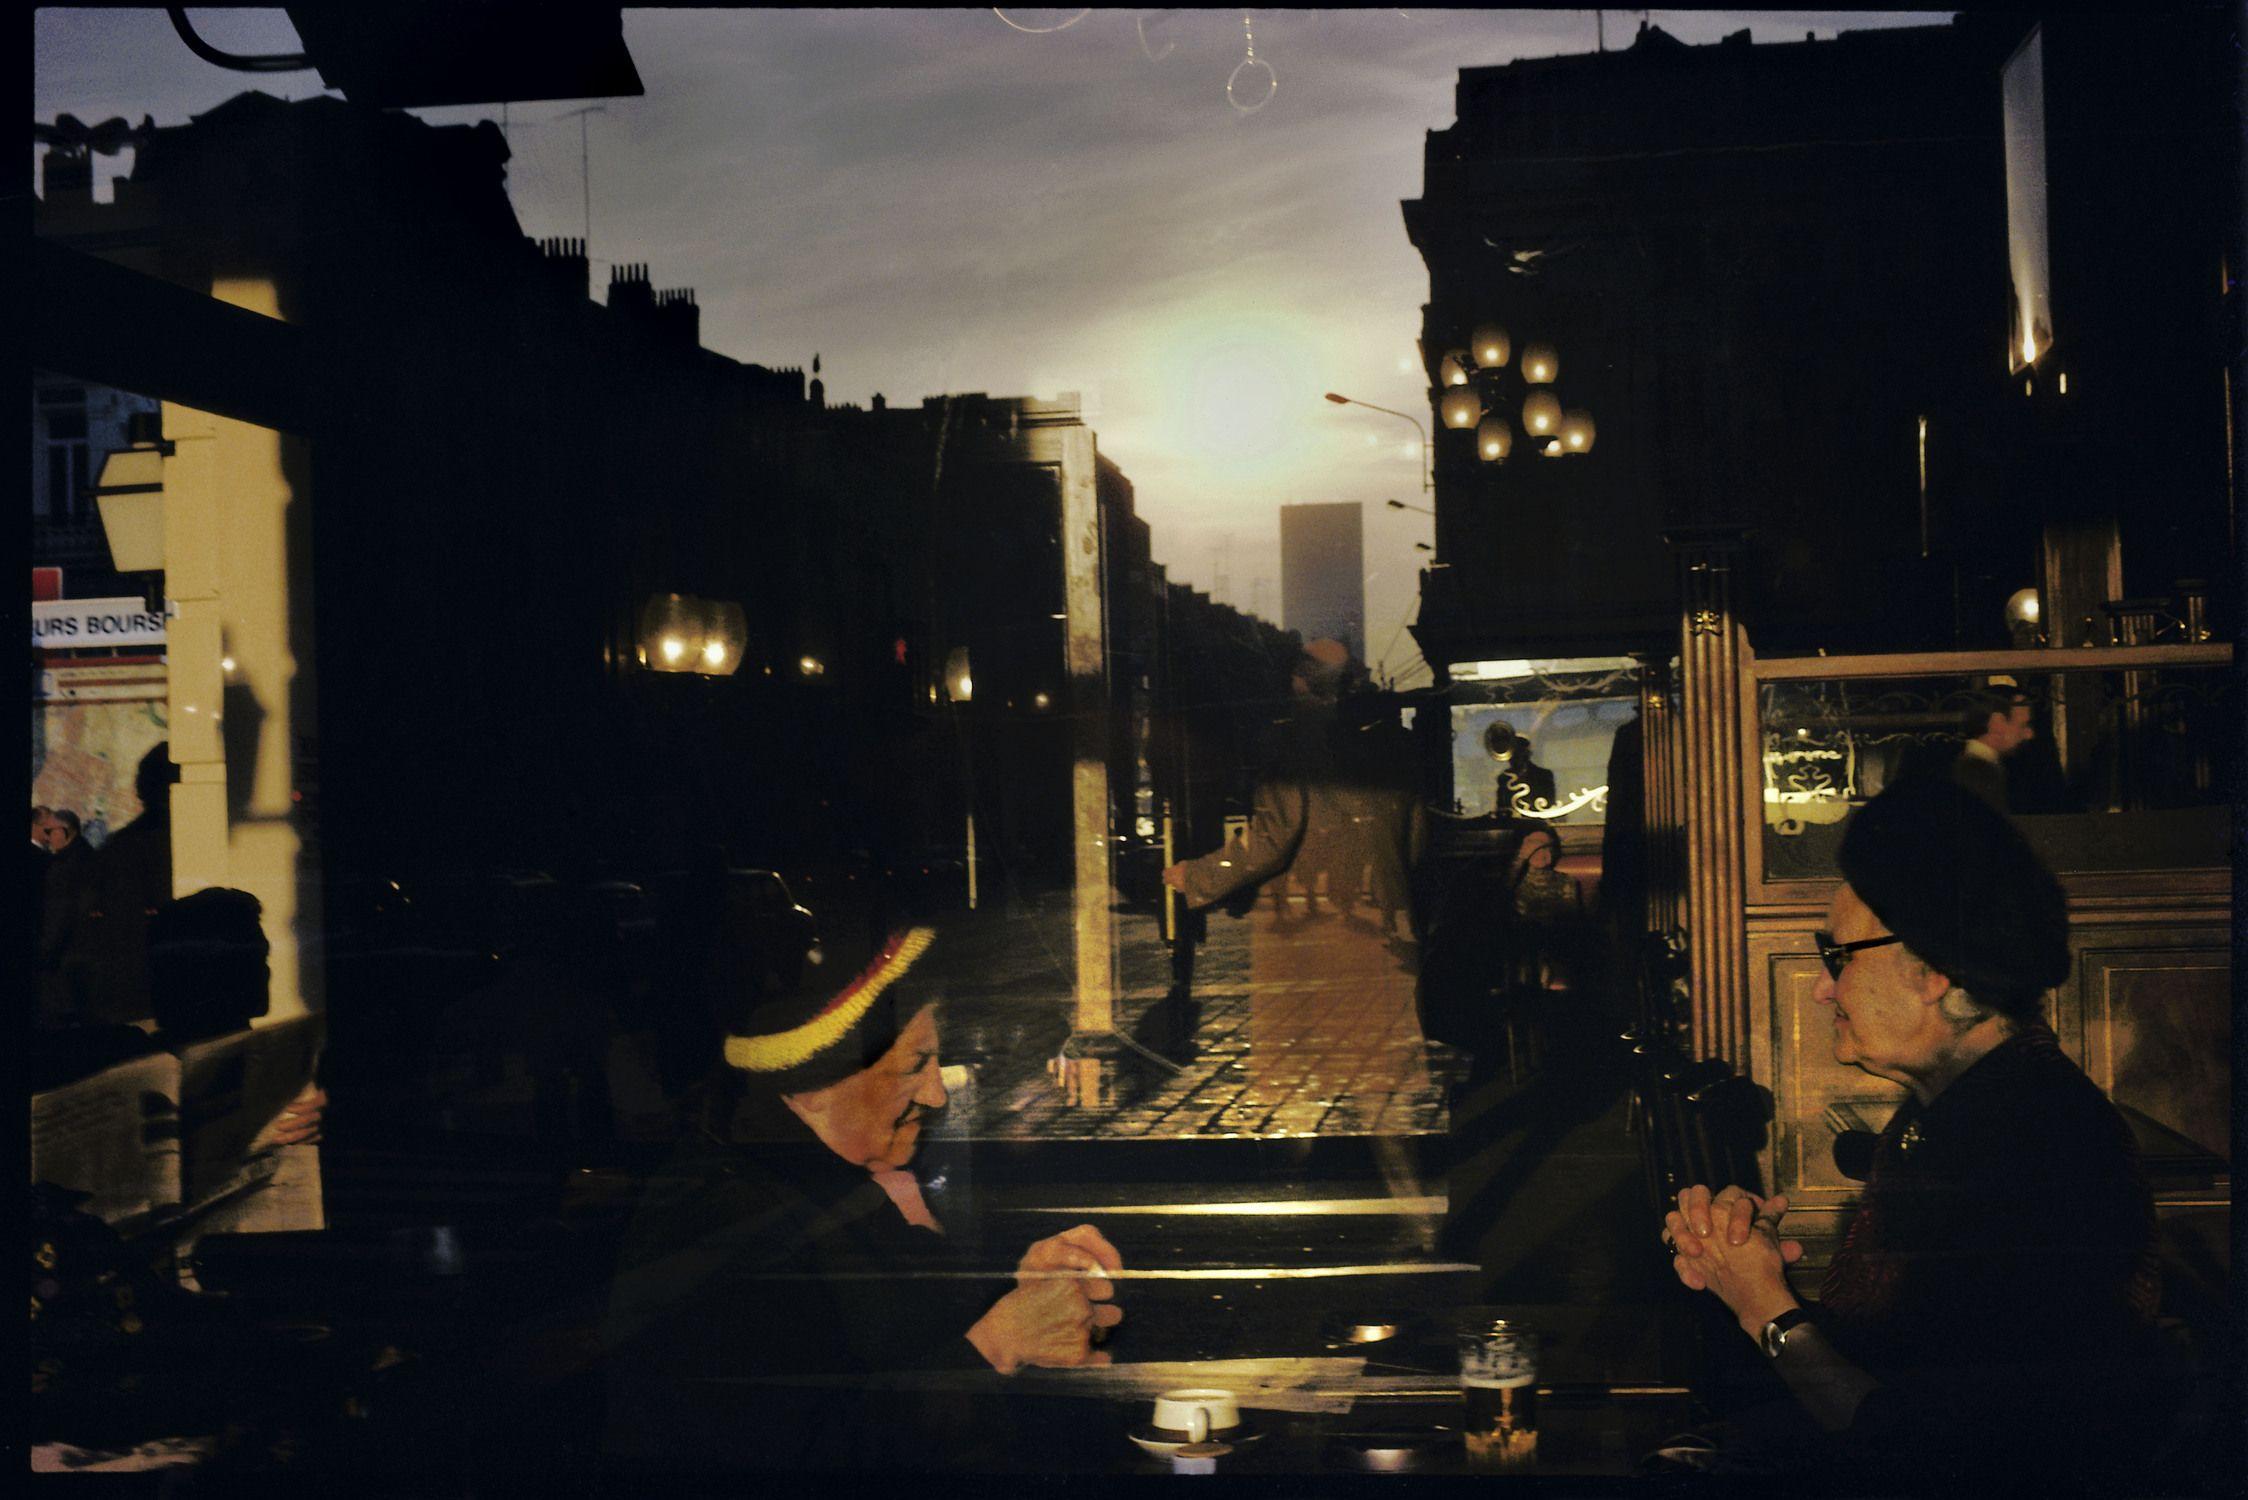 Harry Gruyaert Magnum Photos World Photography Photographer Portfolio